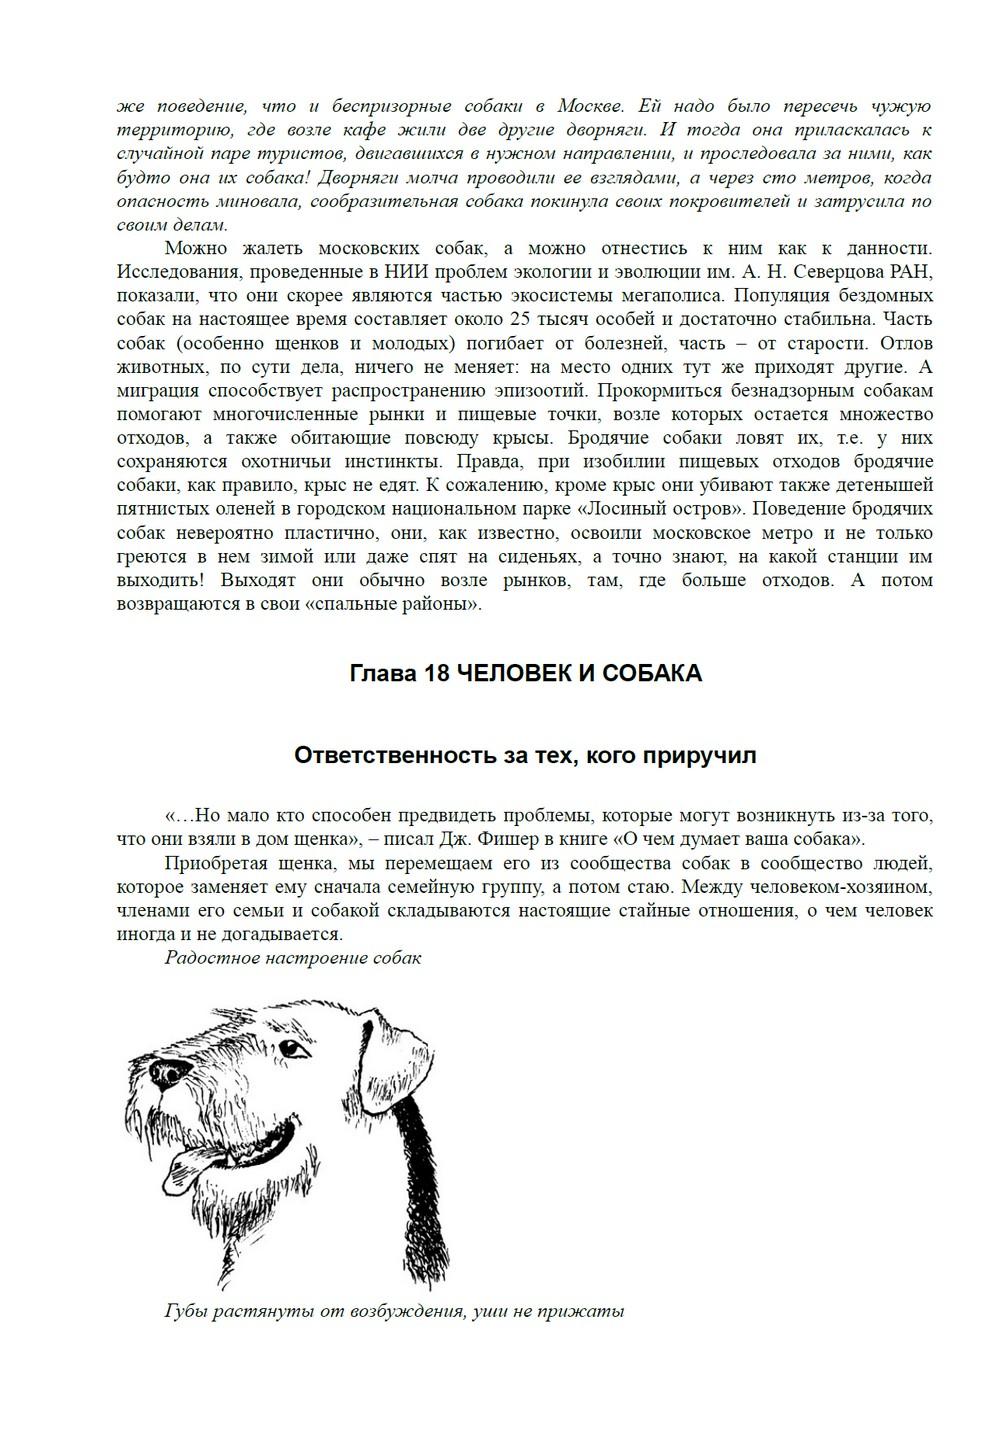 http://i6.imageban.ru/out/2013/11/11/b47df87e0070f263667a41b7603d7c8c.jpg